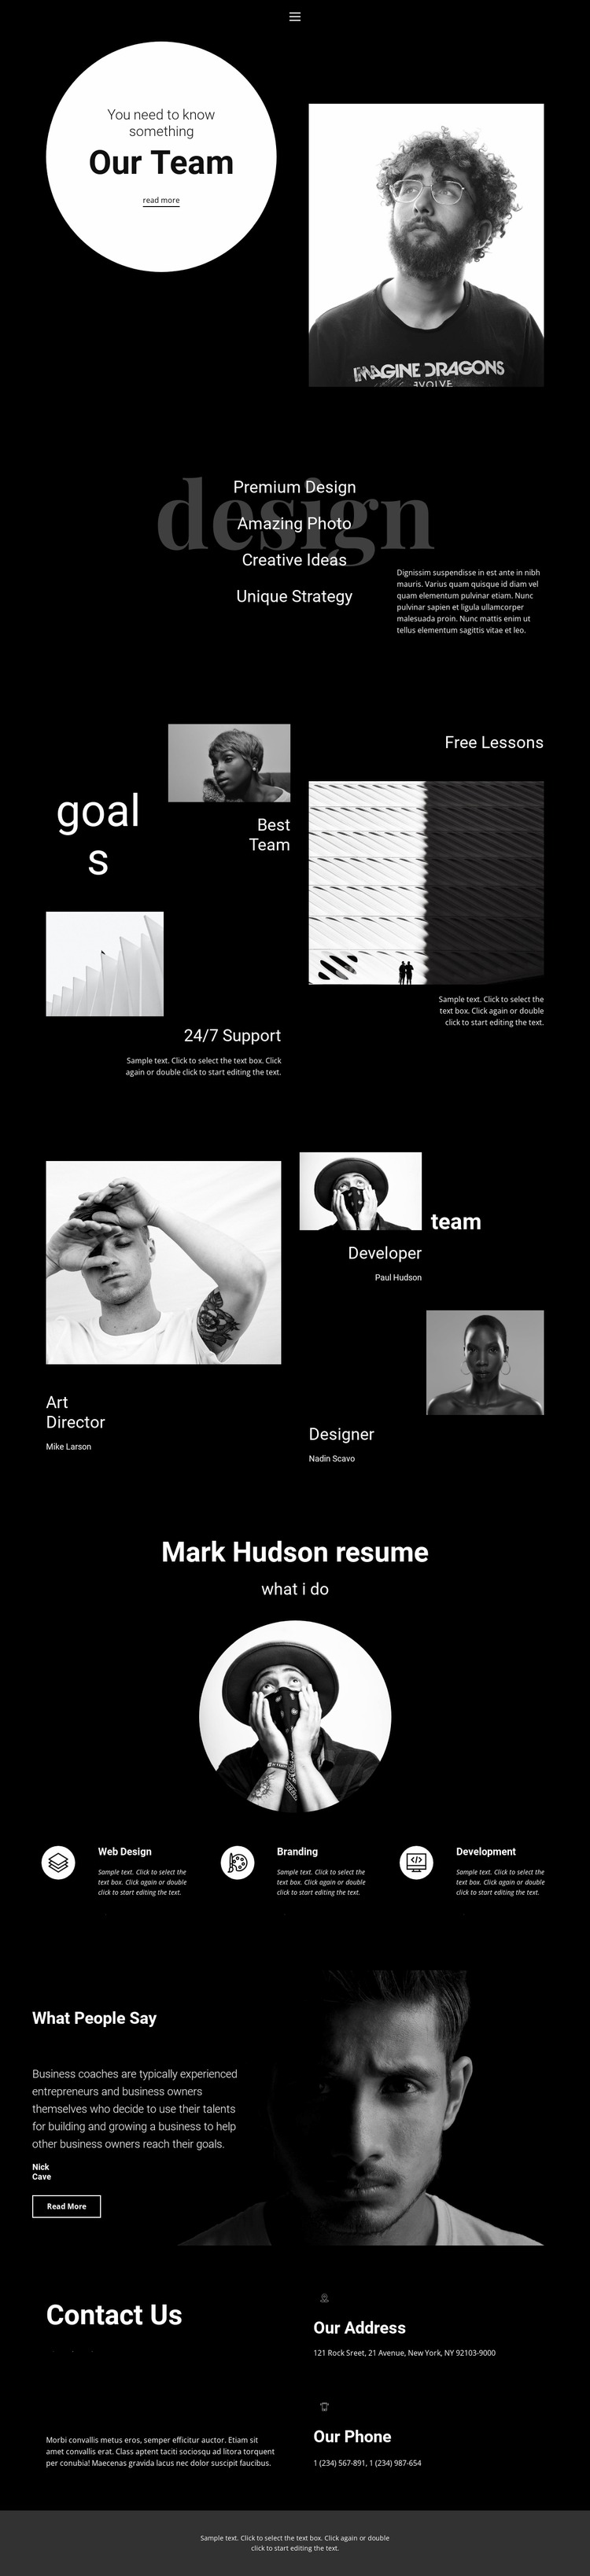 Design and development team WordPress Website Builder